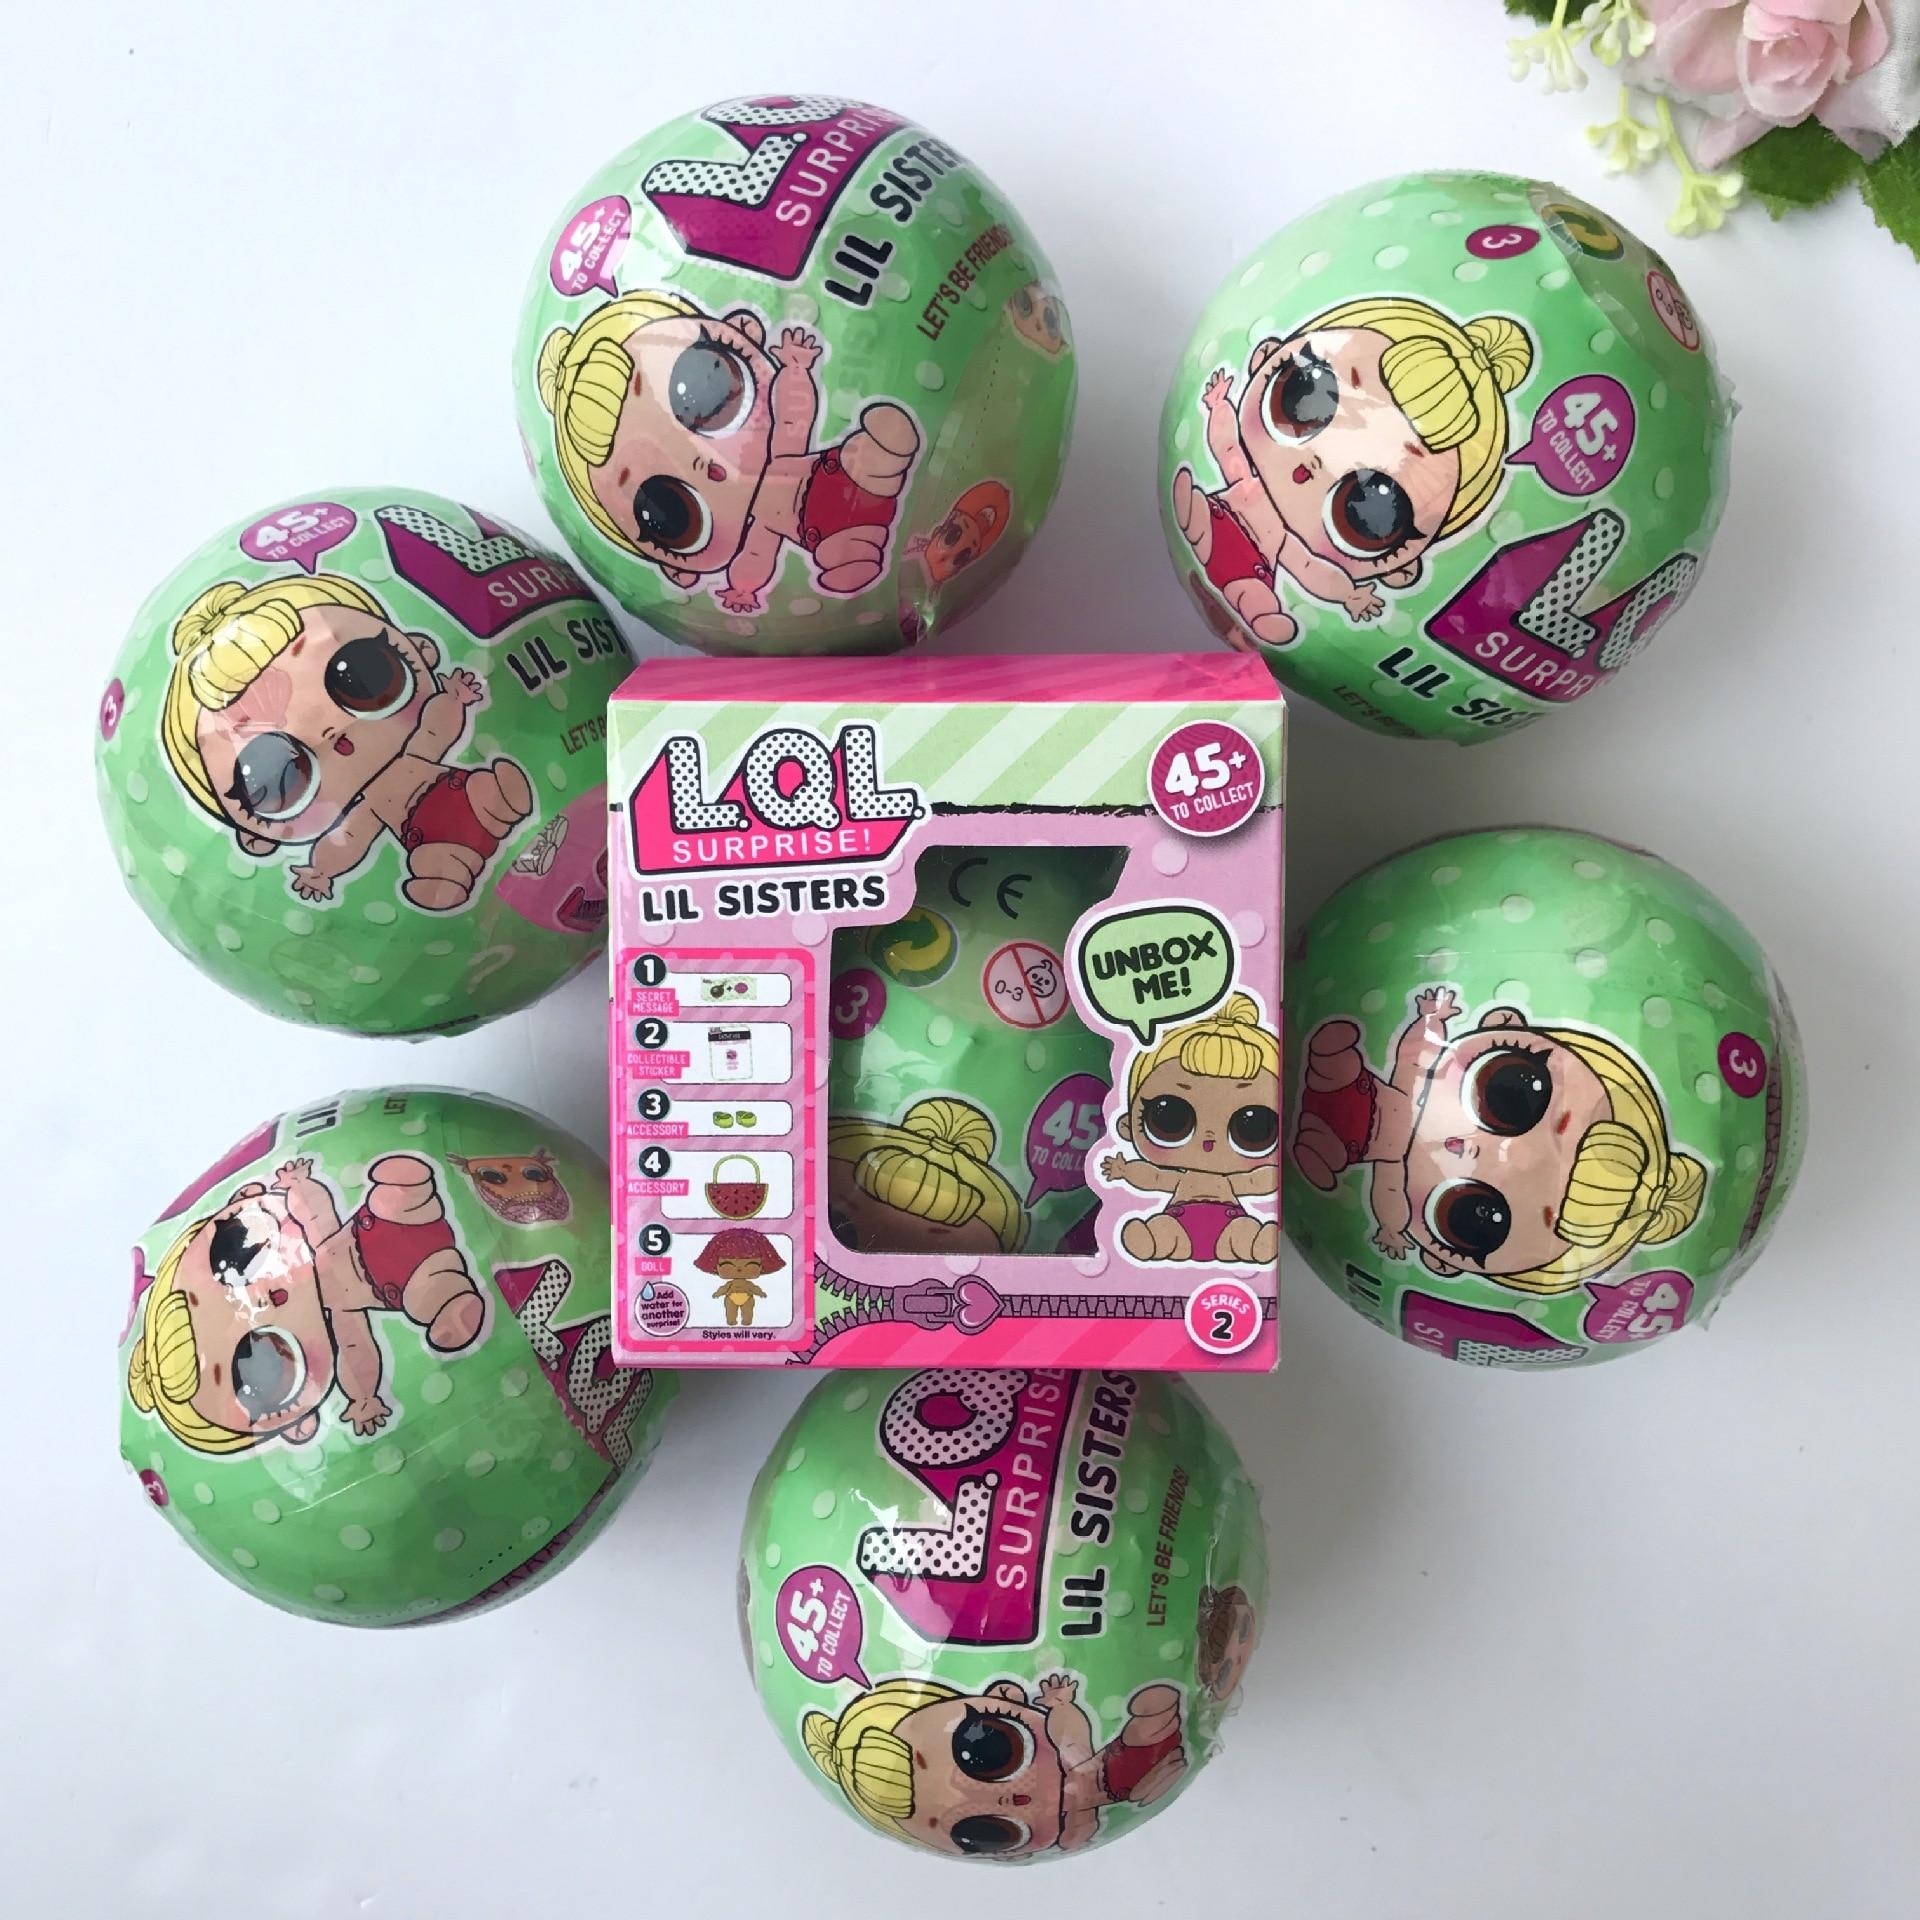 7cm-boneca-Surprise-Dress-Change-LOL-SURPRISE-DOLL-Baby-Tear-Open-Color-Change-Egg-Doll-Action-Figure-Toys-Send-Random-Kids-Gift-2